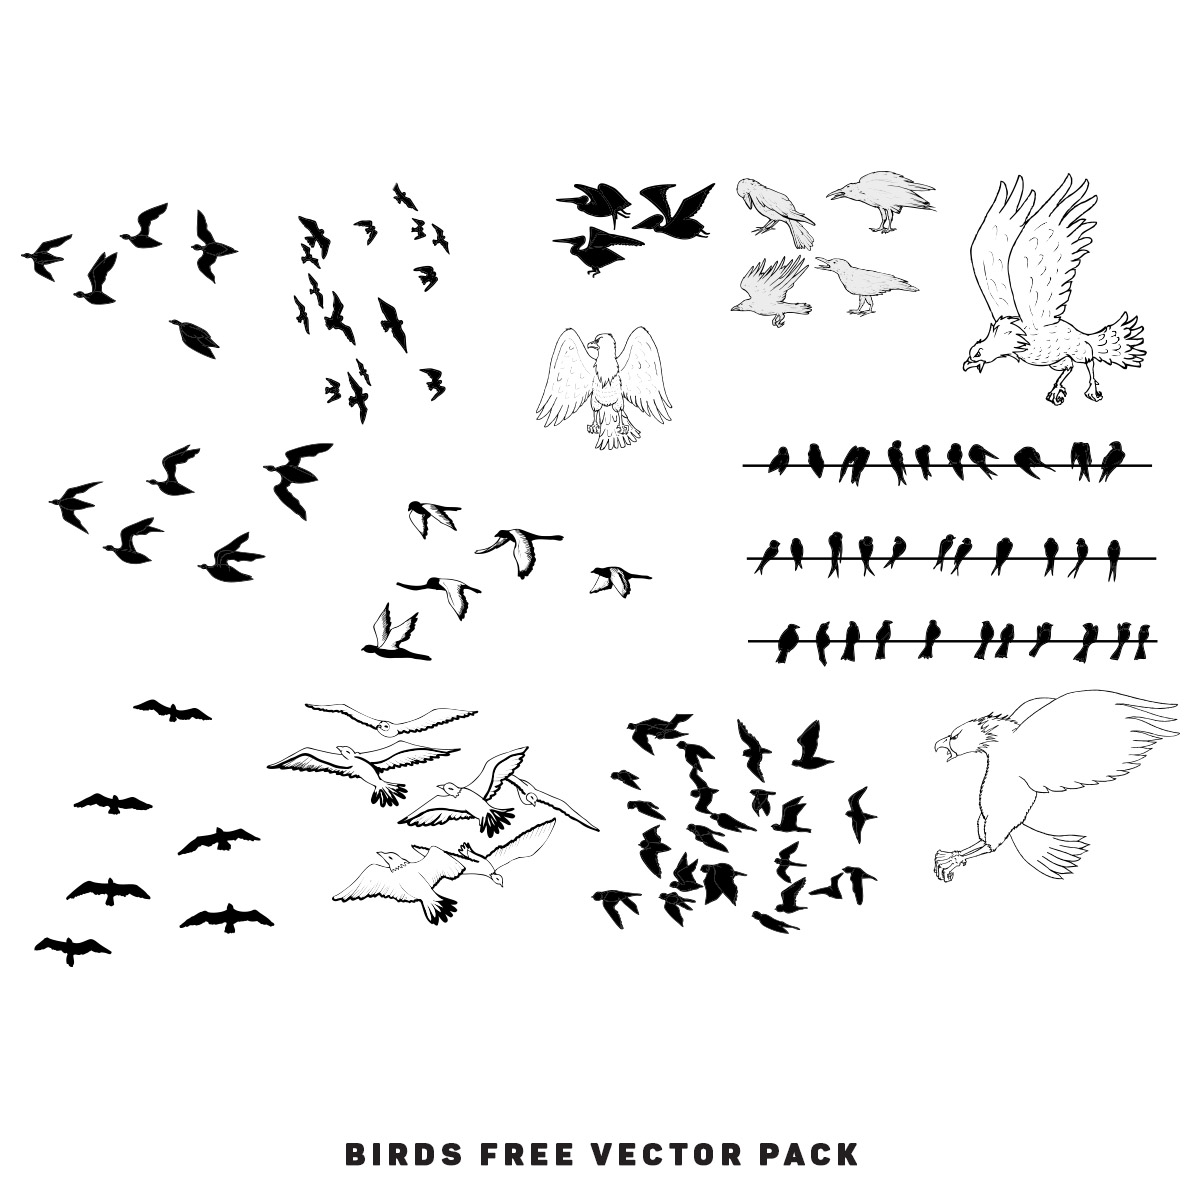 Birds Free Vector Pack